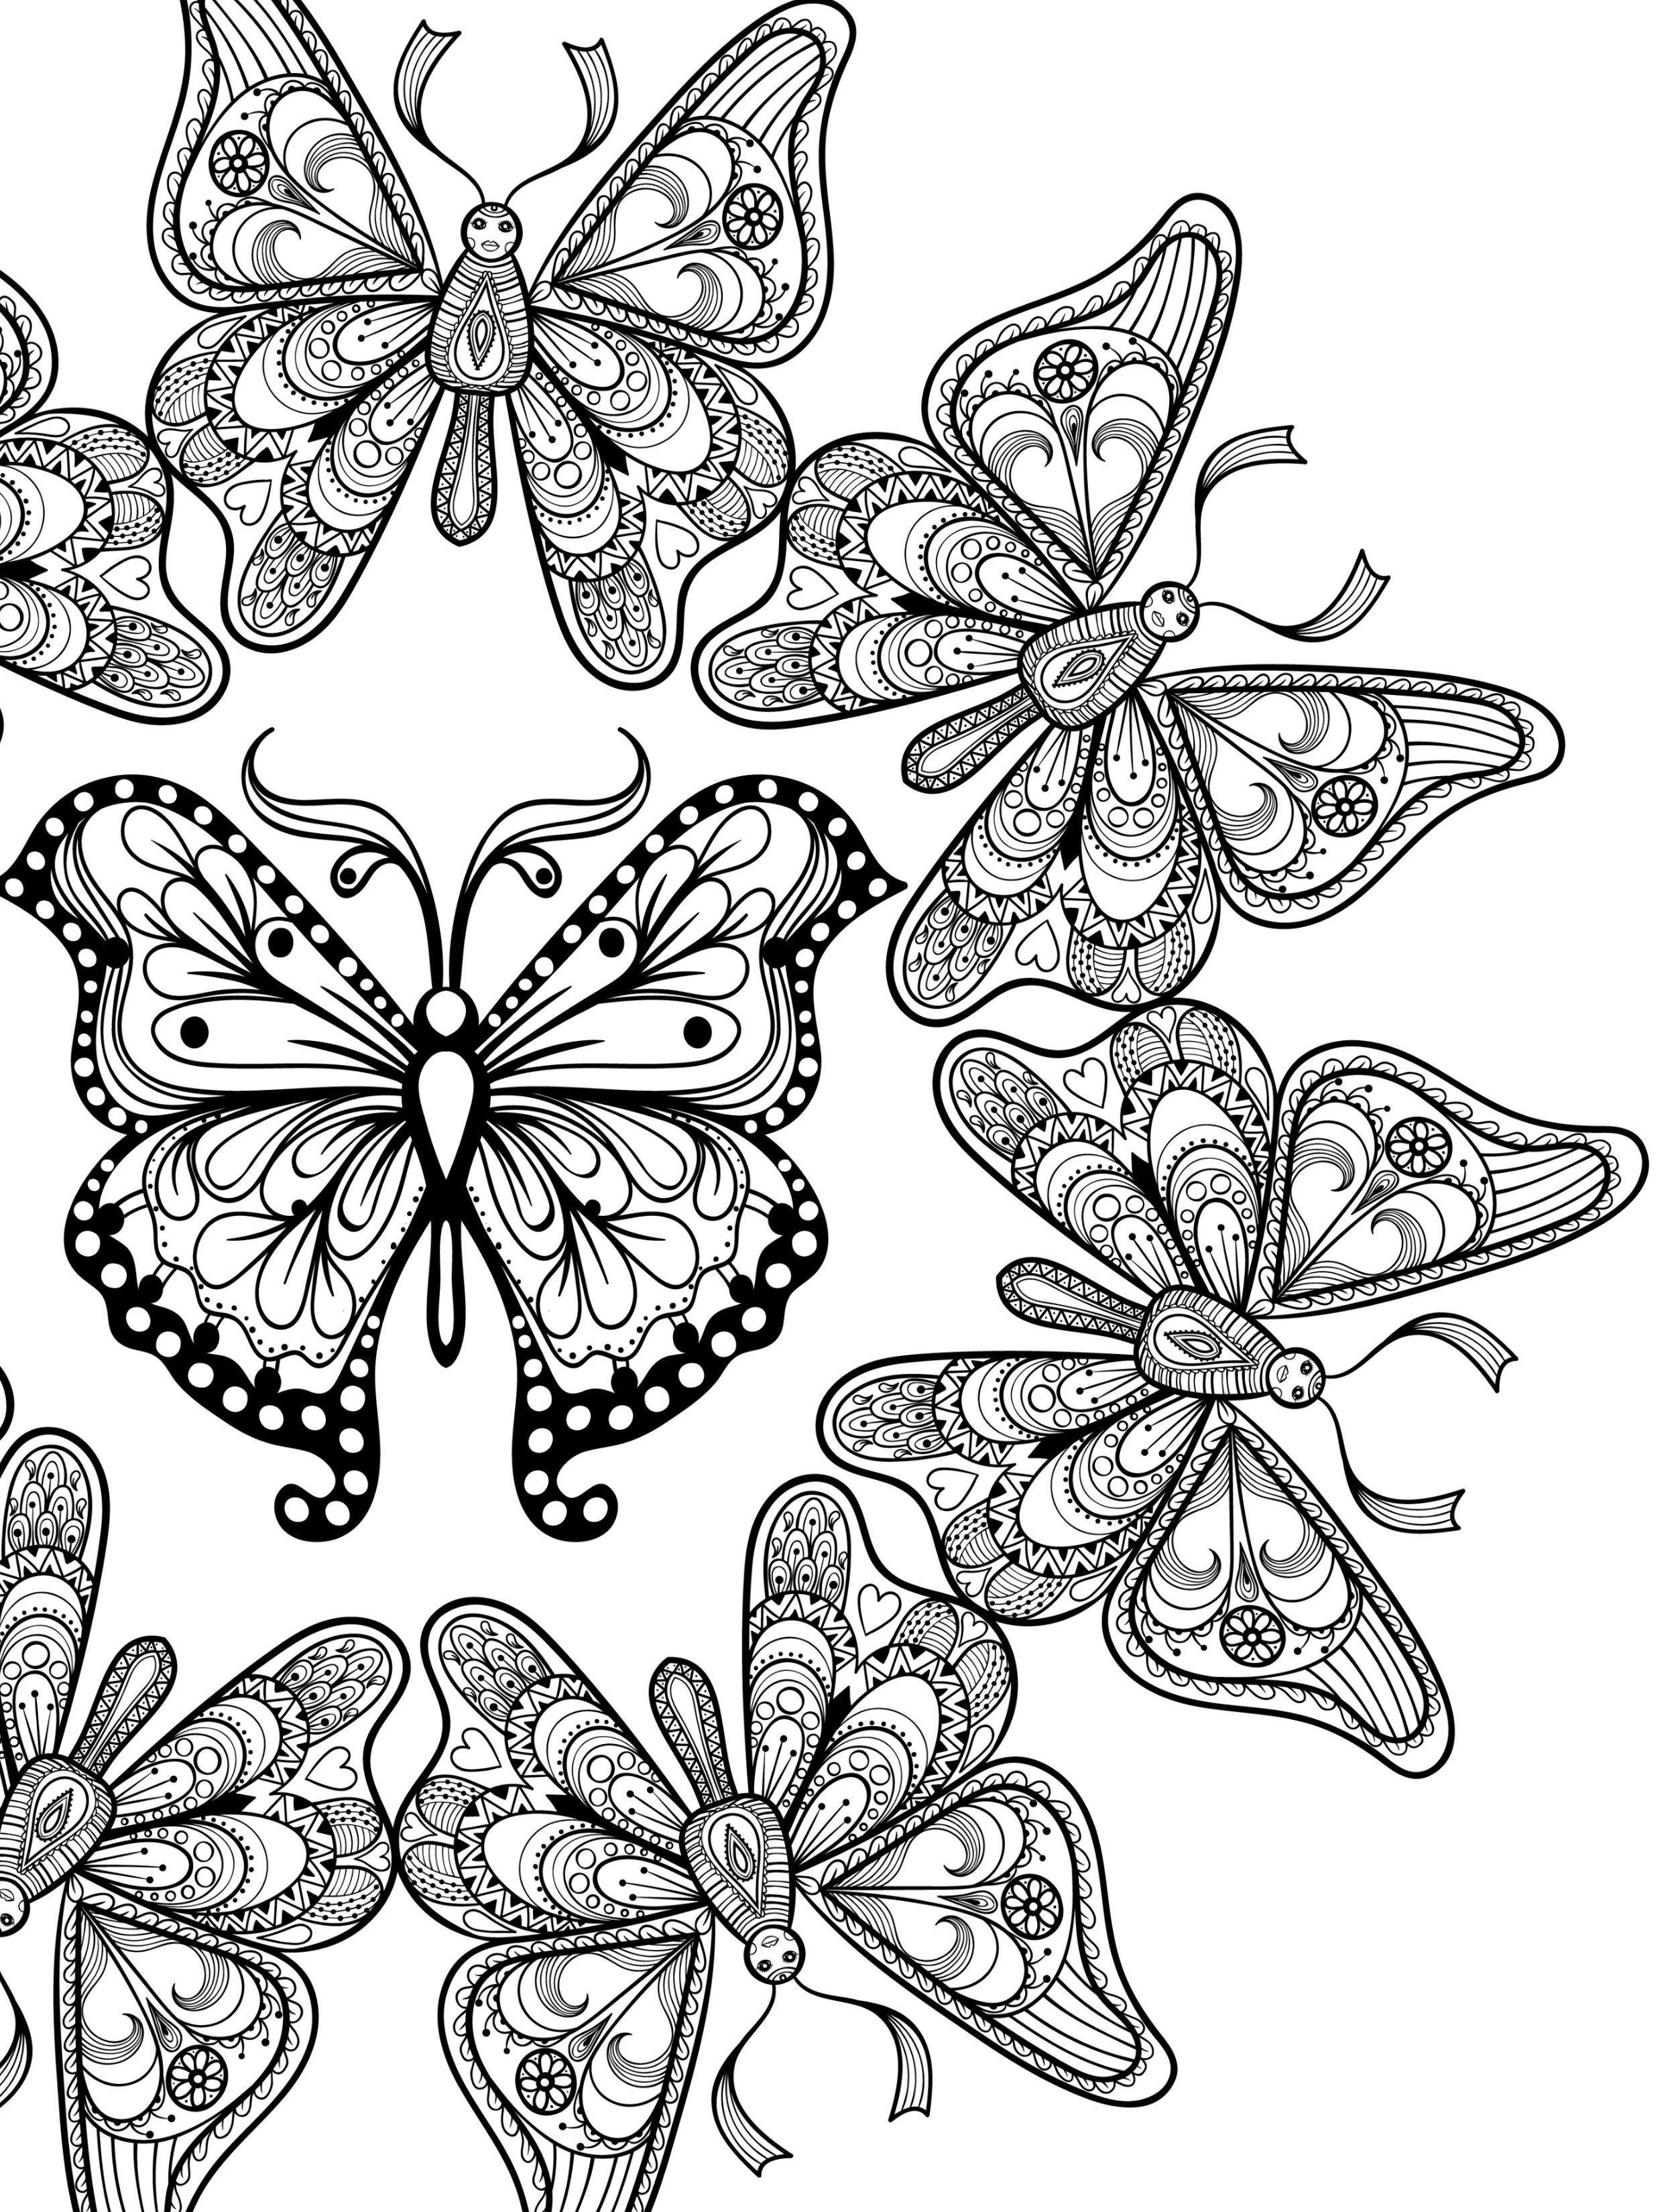 Pin de A Pop of Red en Printables | Pinterest | Mandalas, Dibujos ...